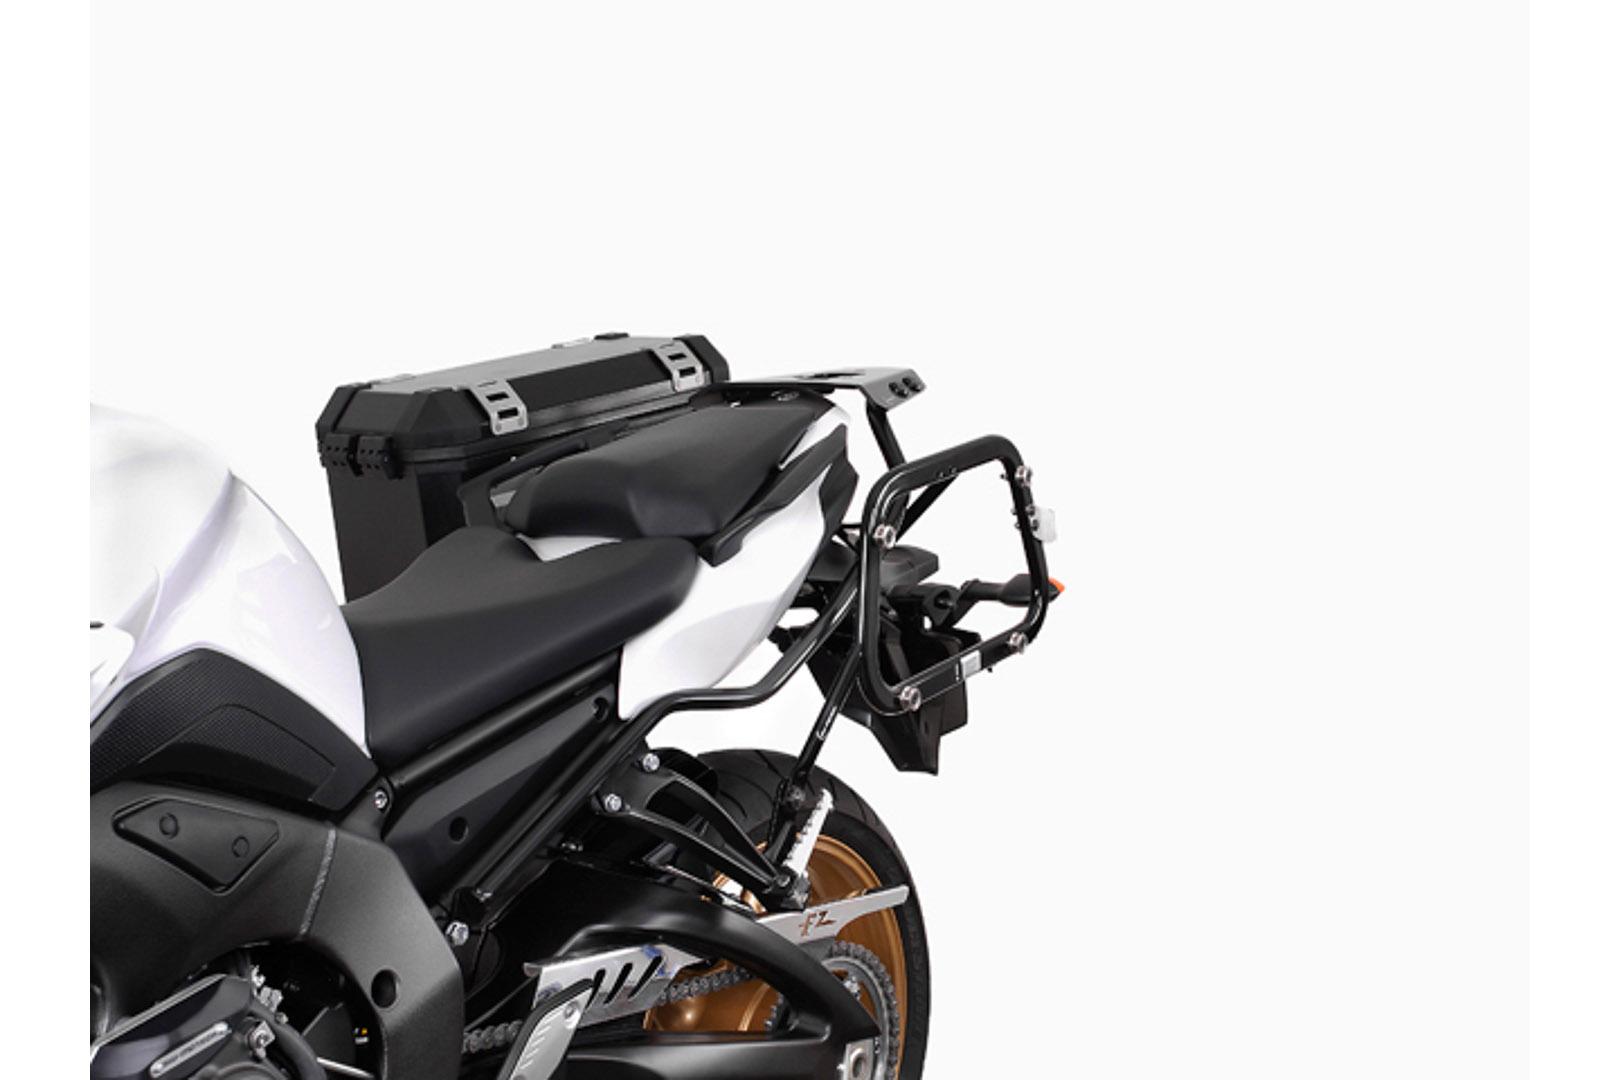 SW-Motech Quick-Lock Evo sivutelinesarja Yamaha FZ8